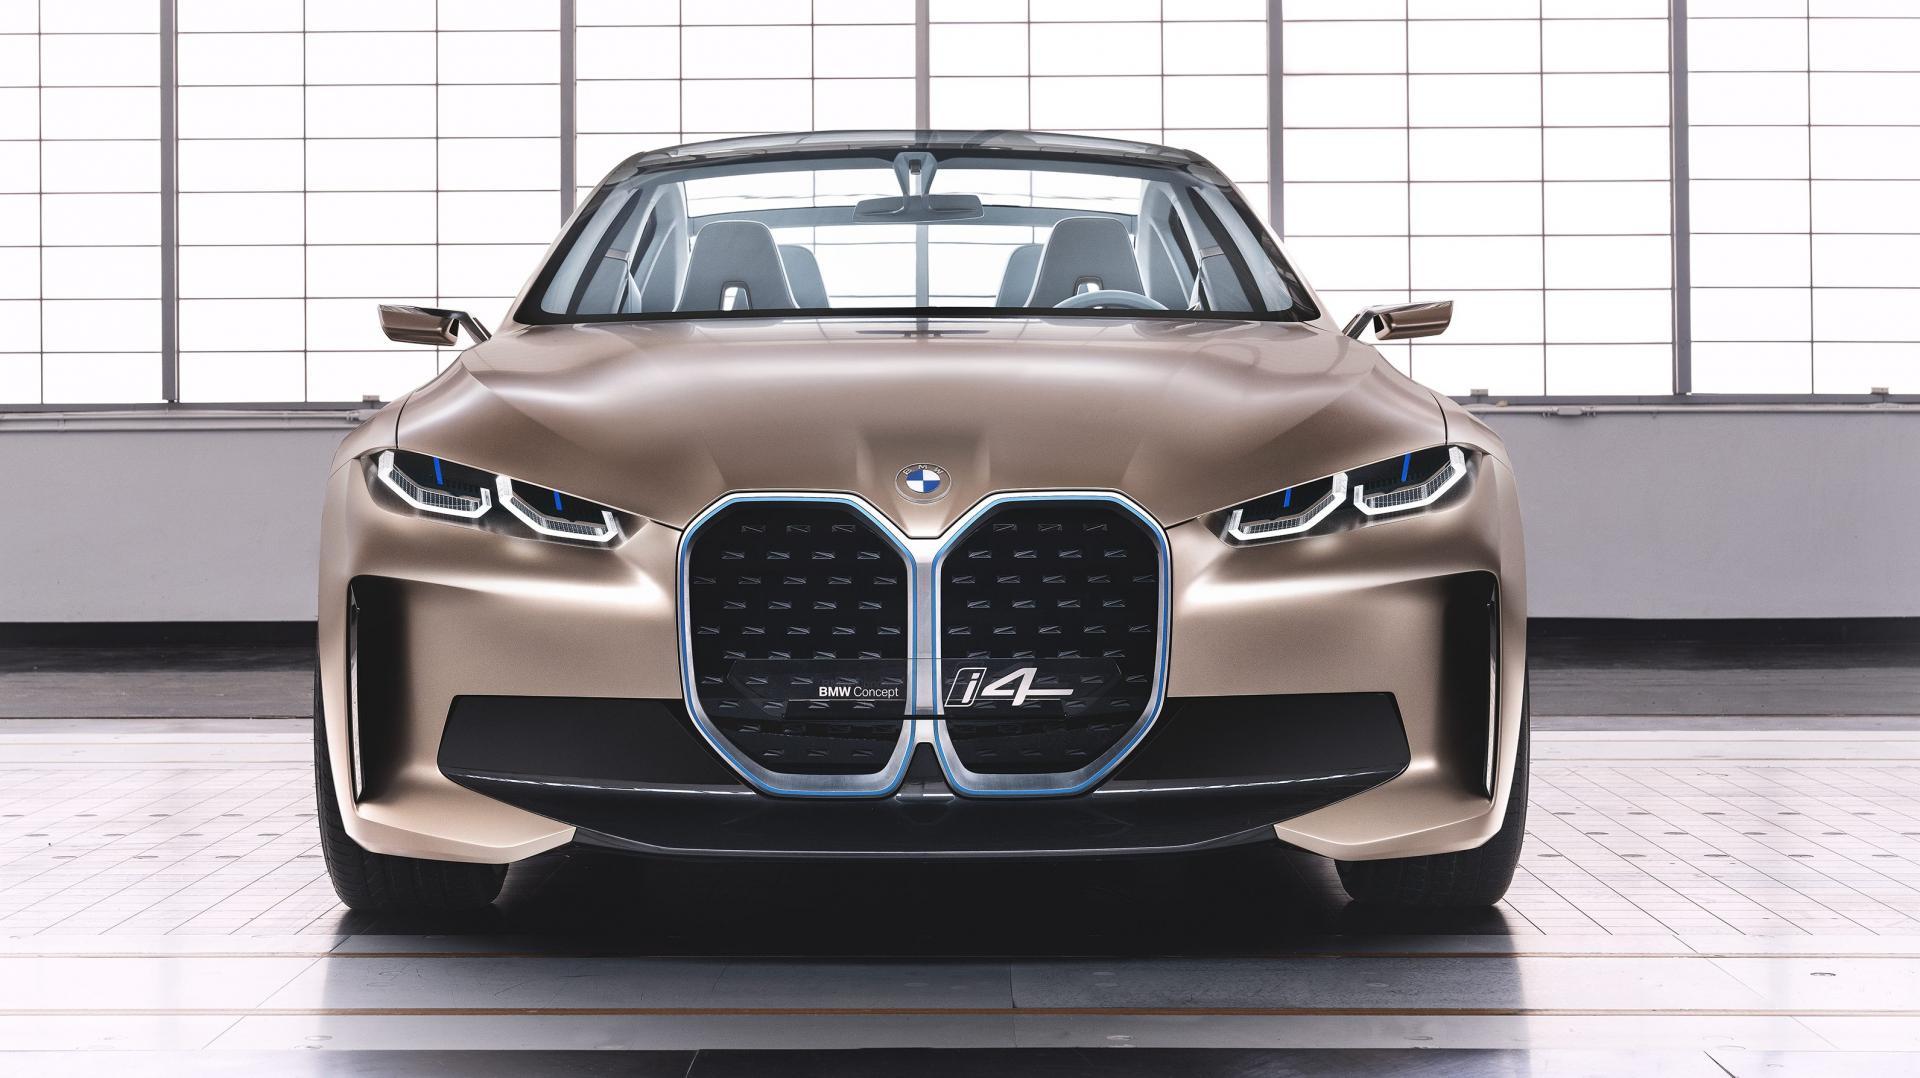 BMW i4 Concept grille nieren